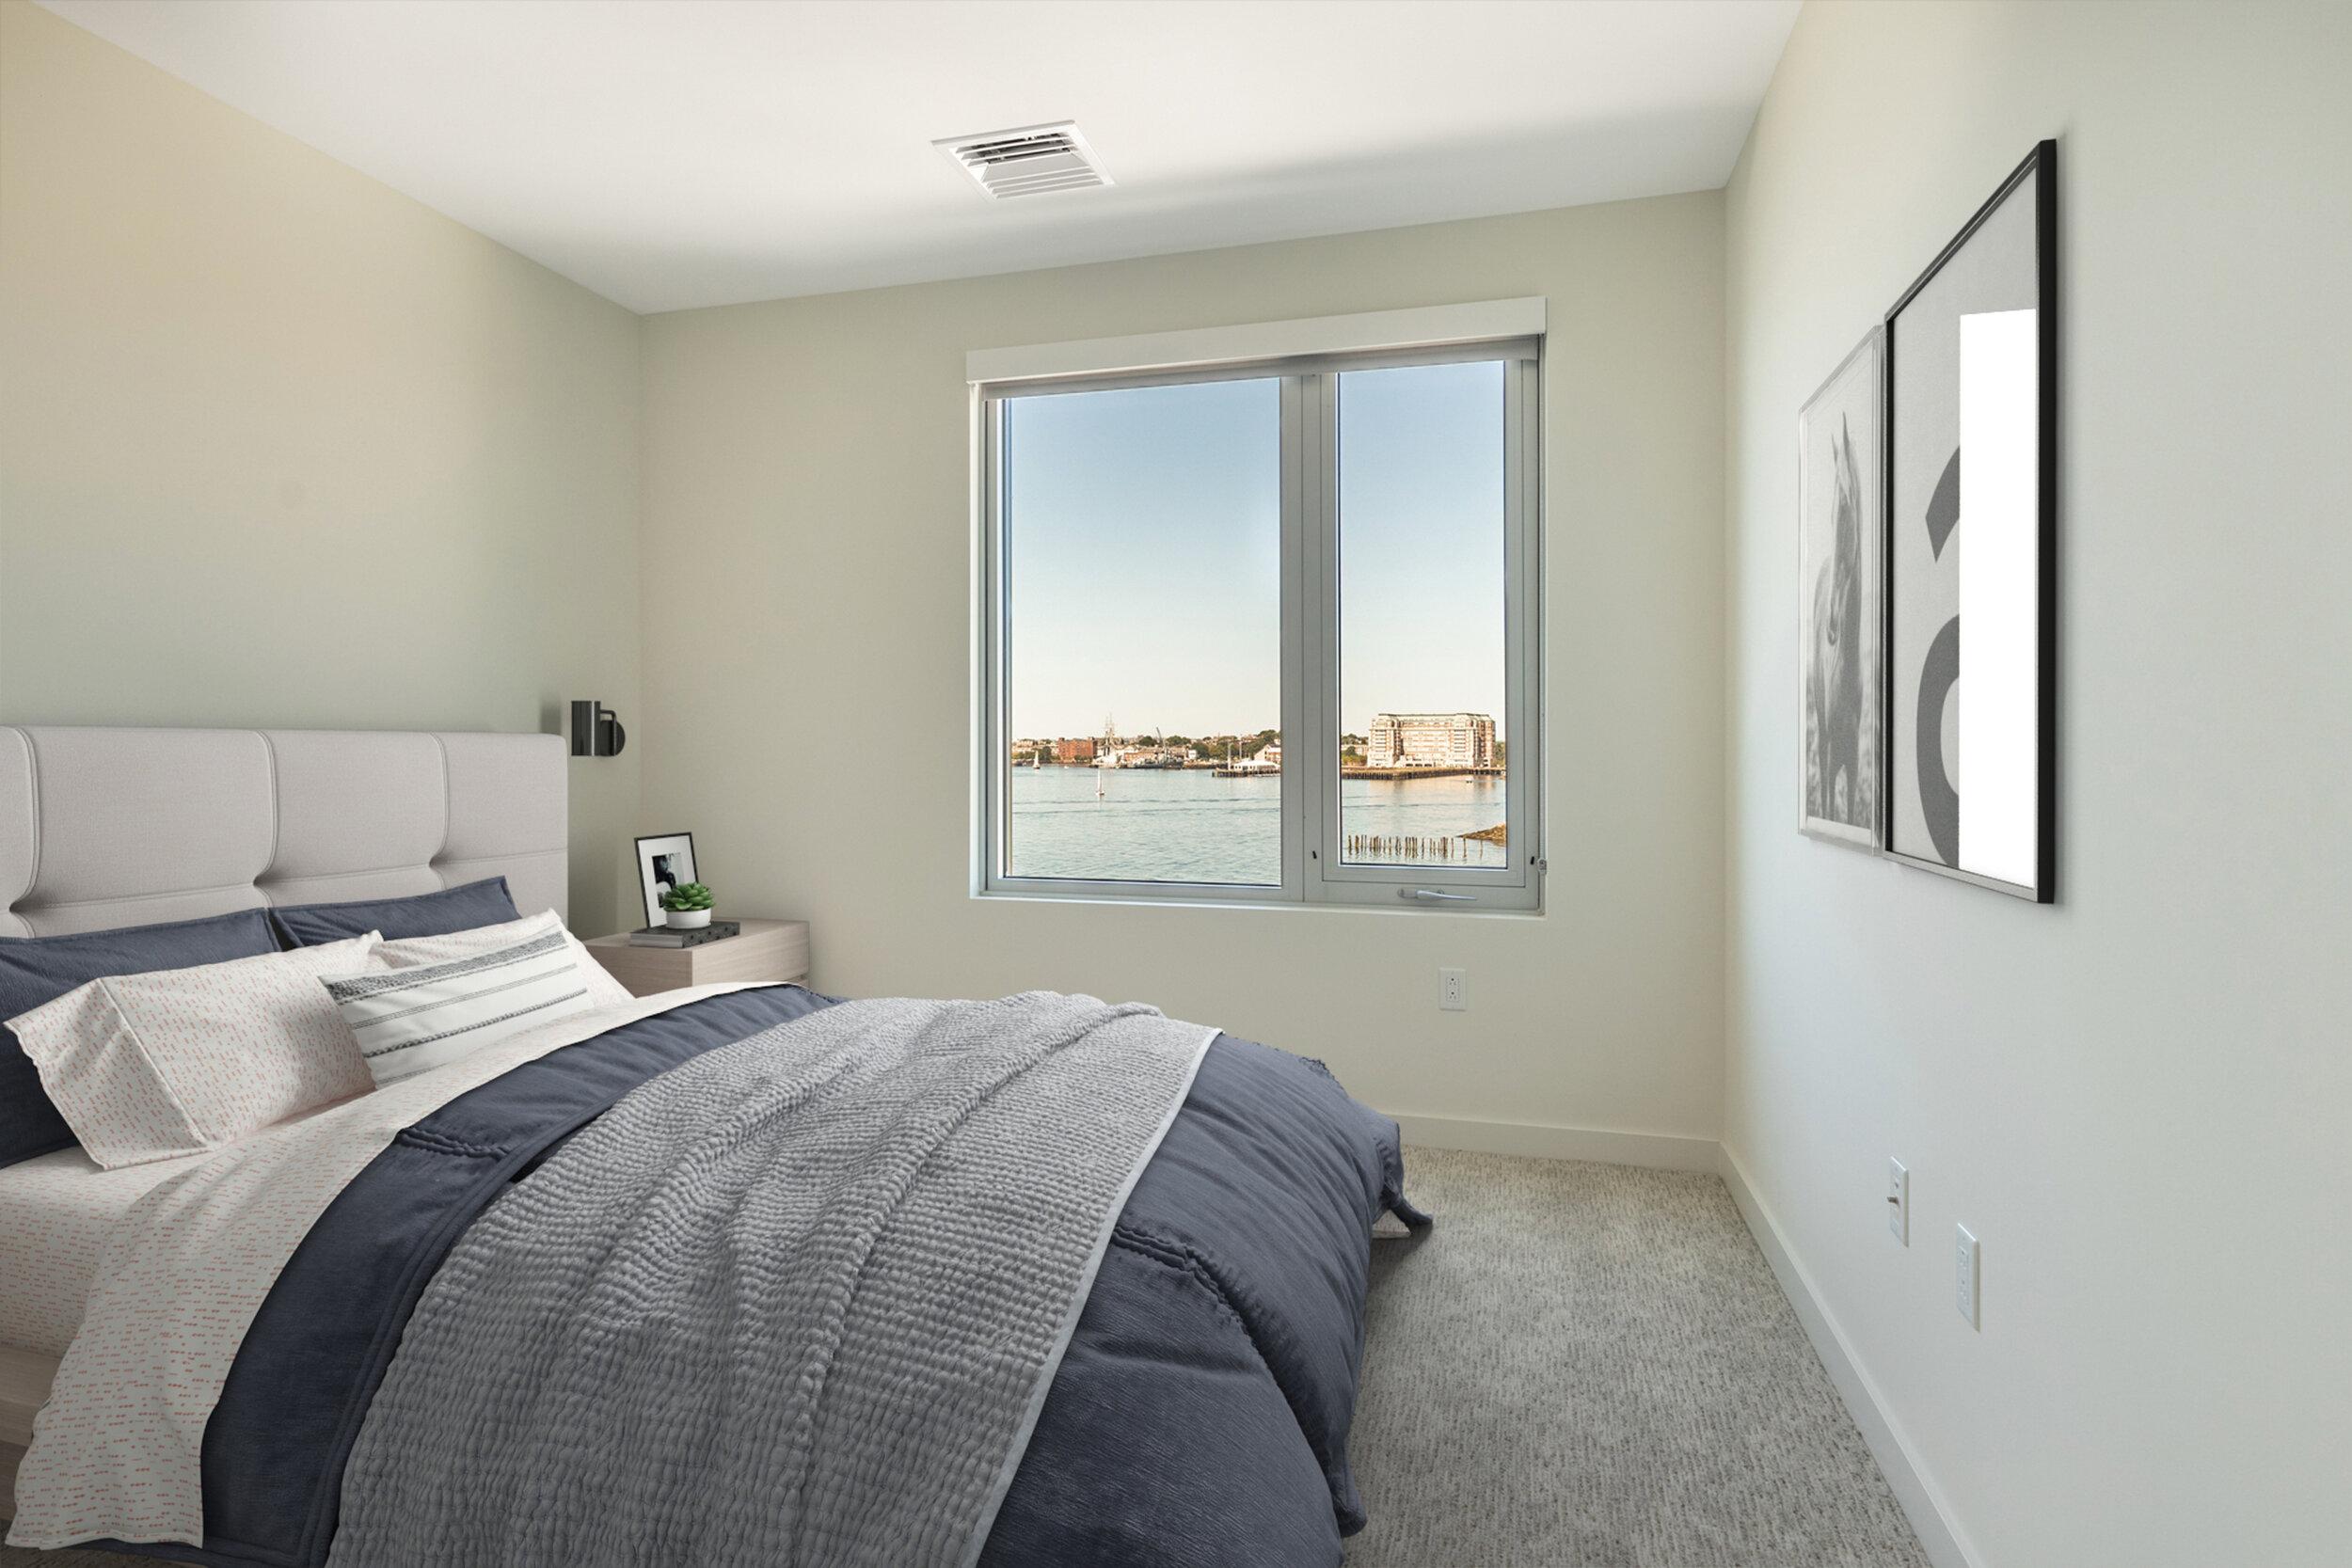 13_Bedroom-.jpg